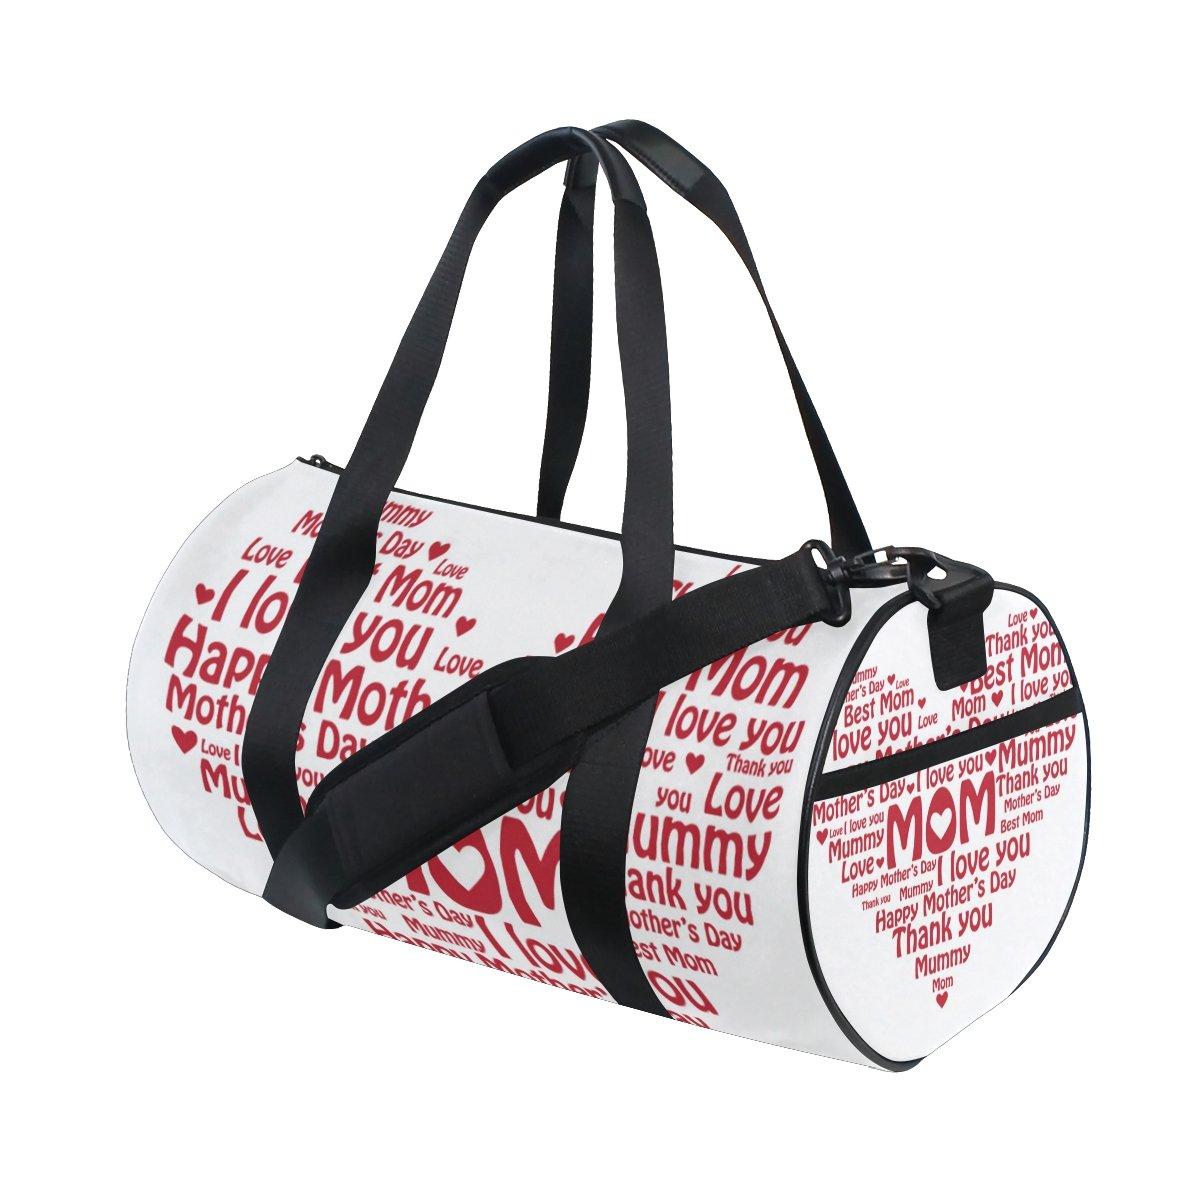 U LIFE Happy Mothers Day Floral Flowers Love Mom Sports Gym Shoulder Handy Duffel Bags for Women Men Kids Boys Girls